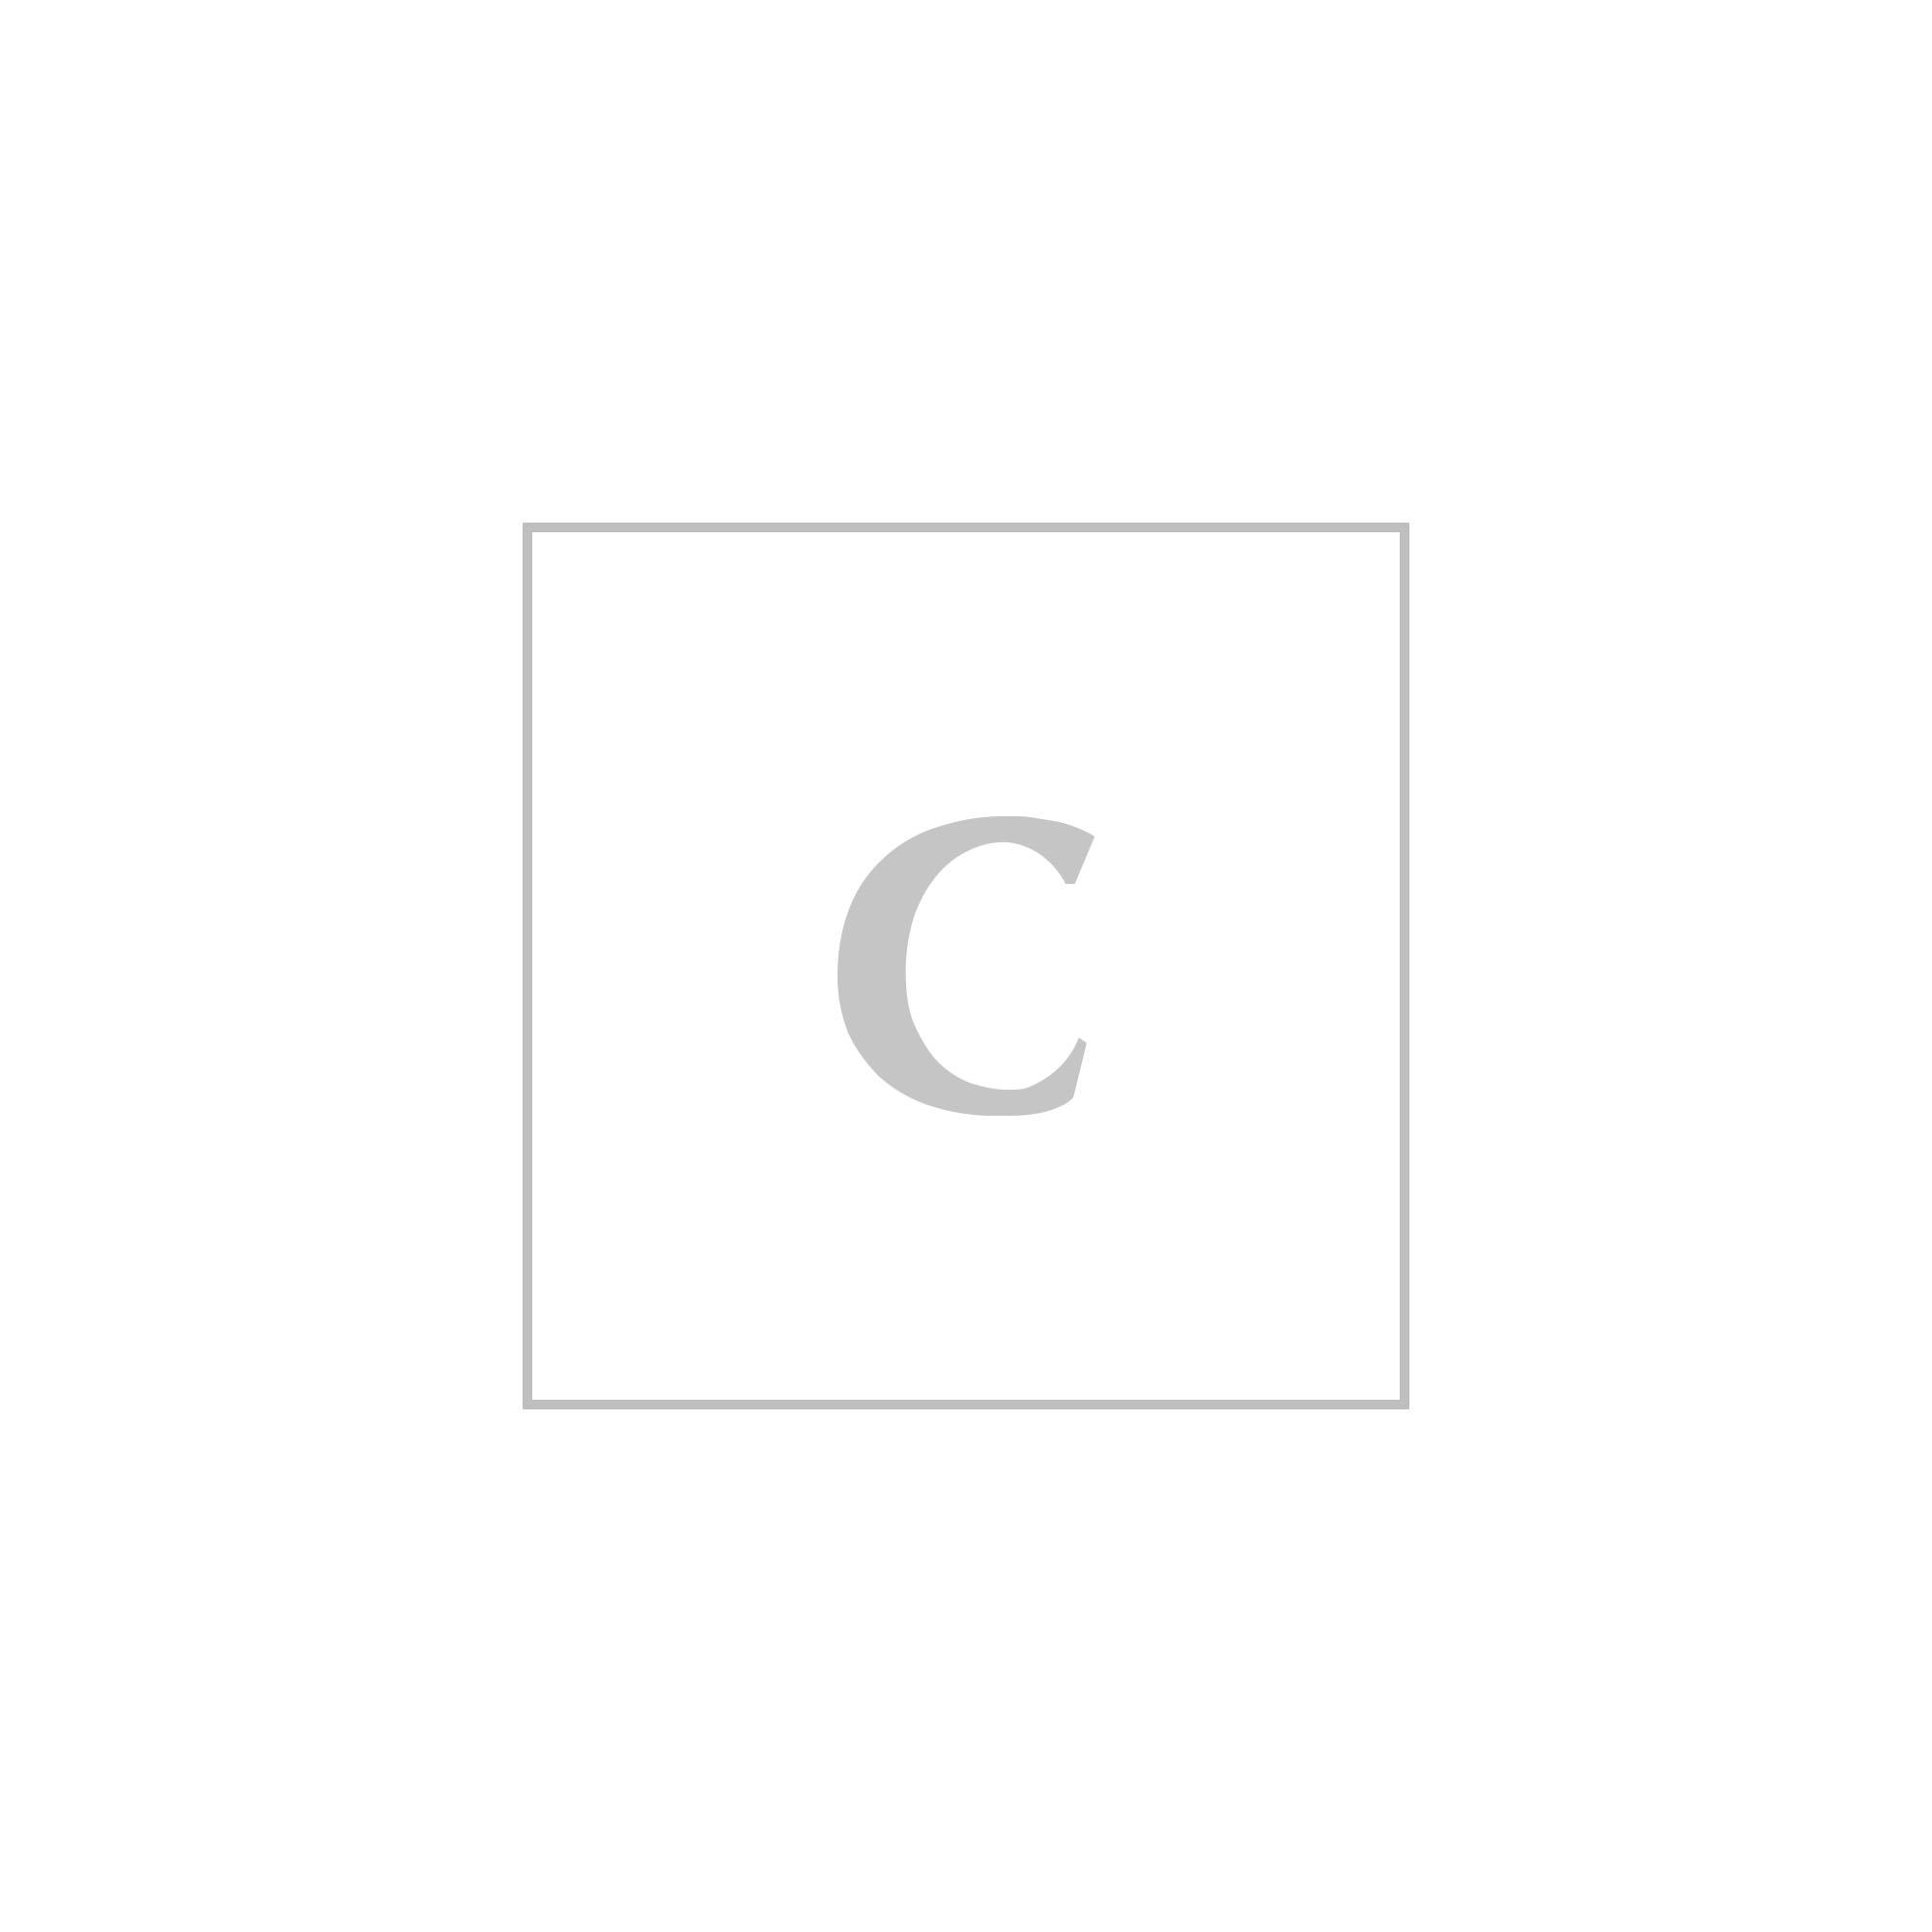 Michael kors p.foglio continental logo